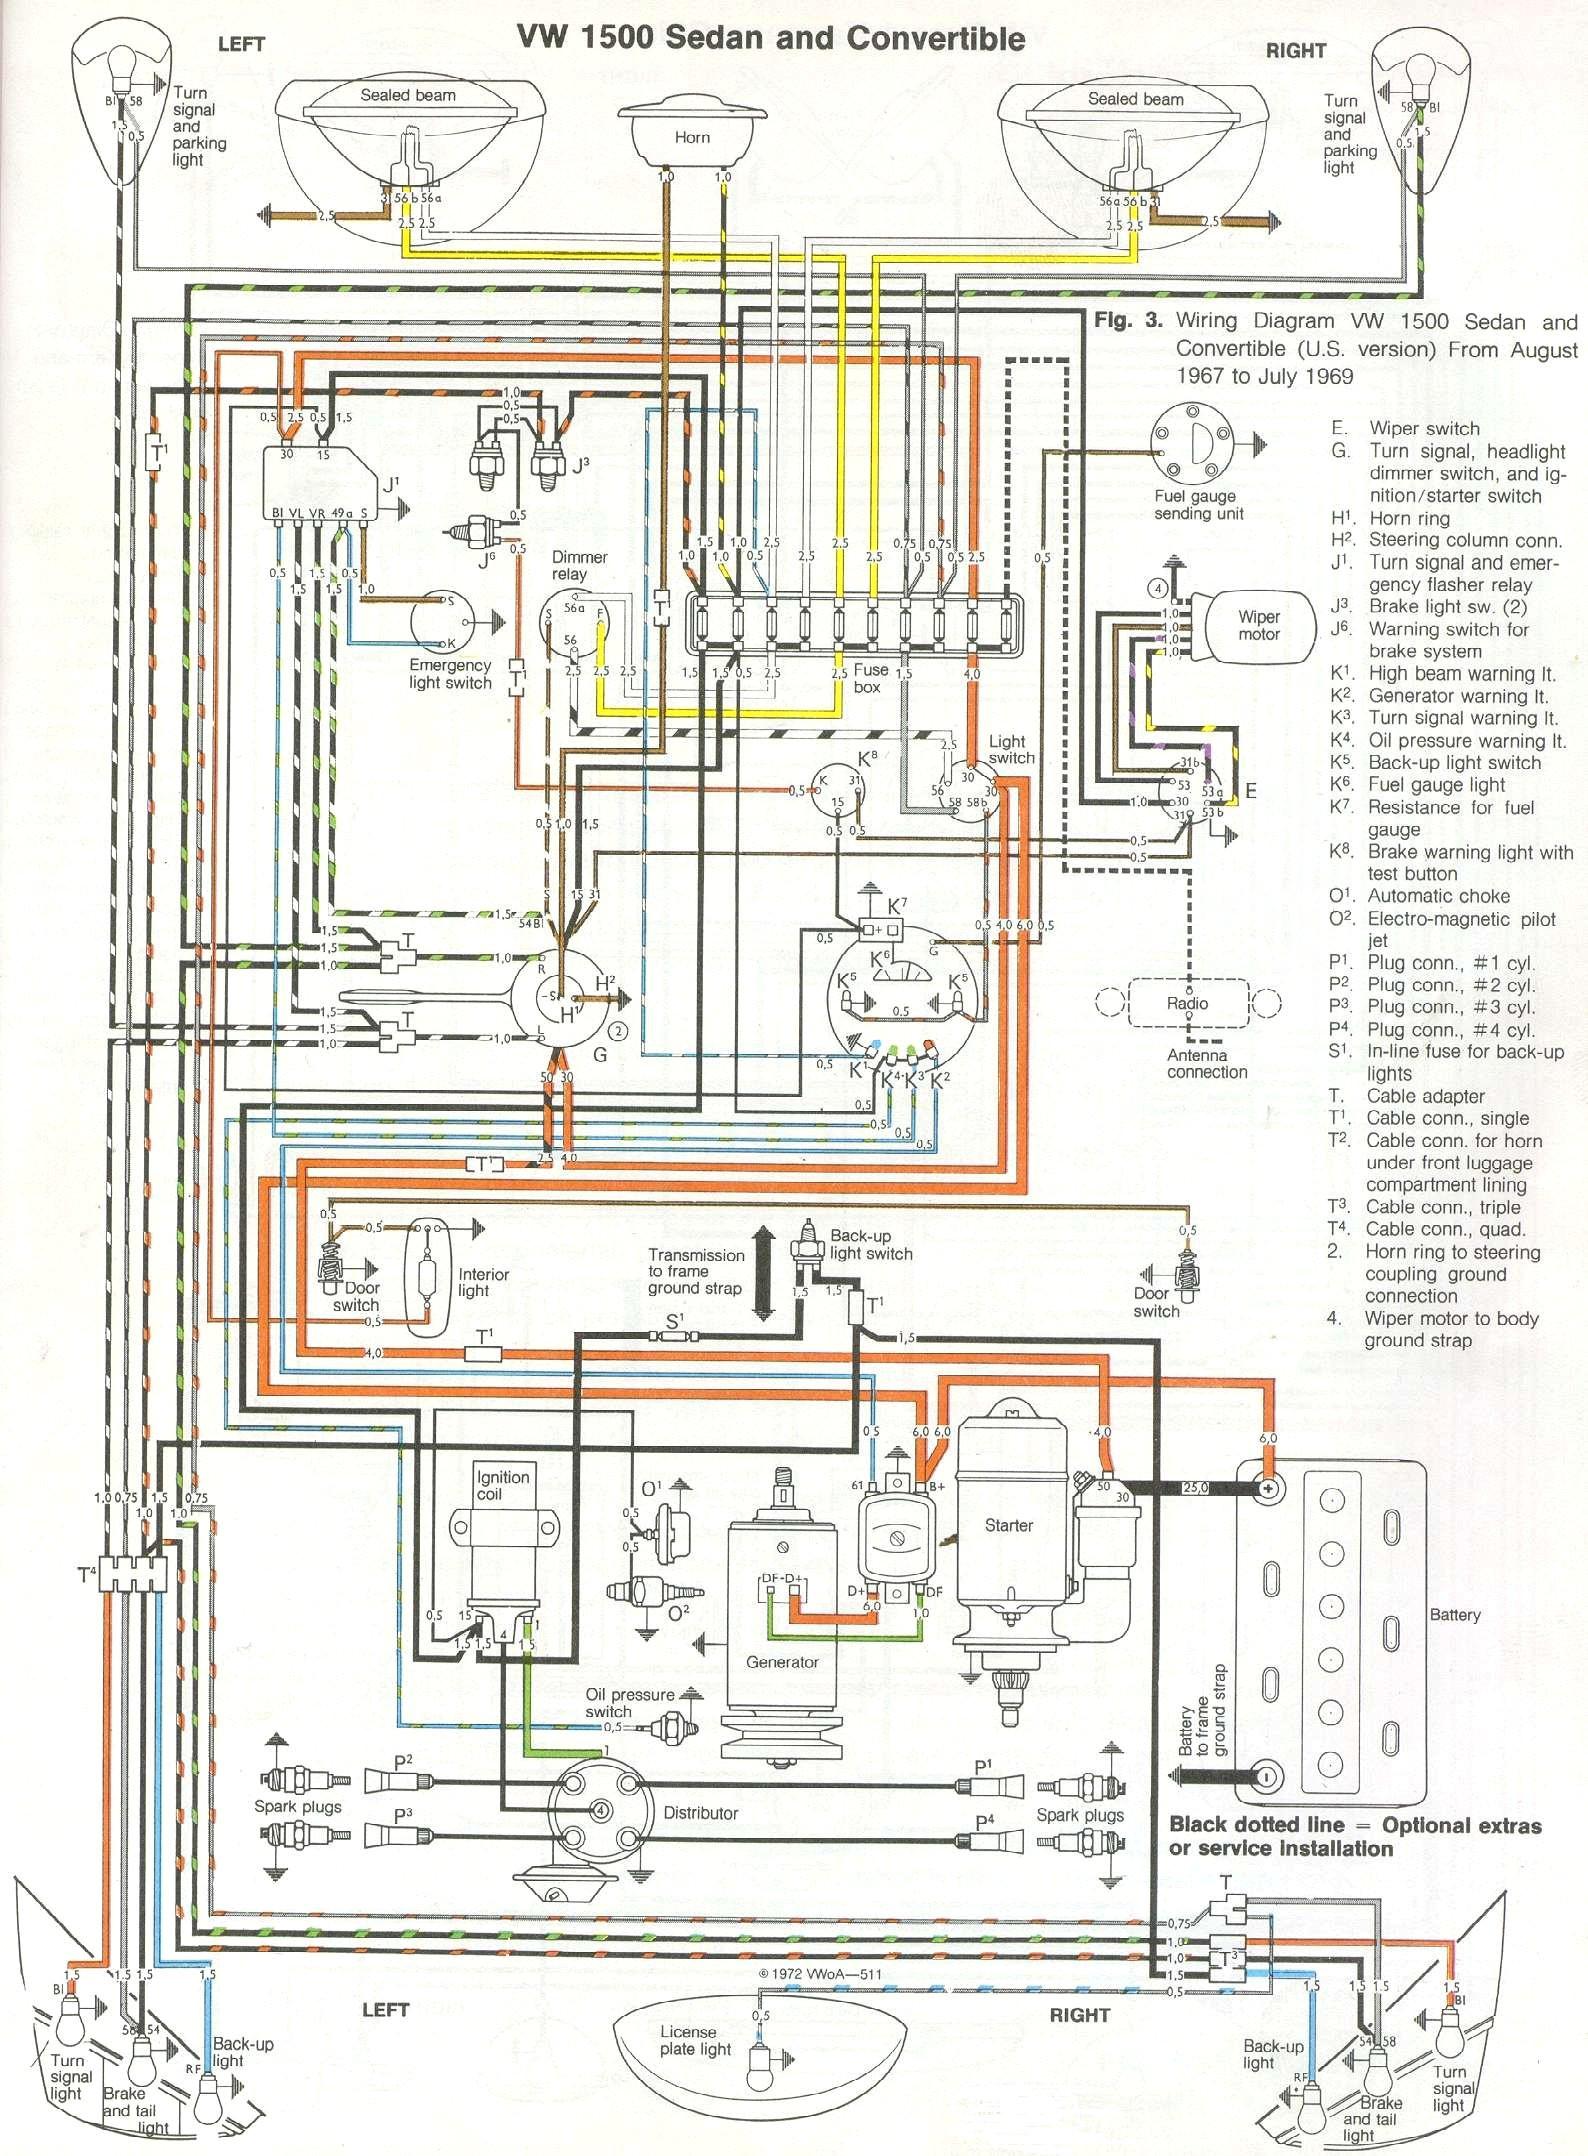 Beetle 1600 Wiring Diagram 1969-71 Beetle Wiring Diagram thegoldenbug.com Of Beetle 1600 Wiring Diagram